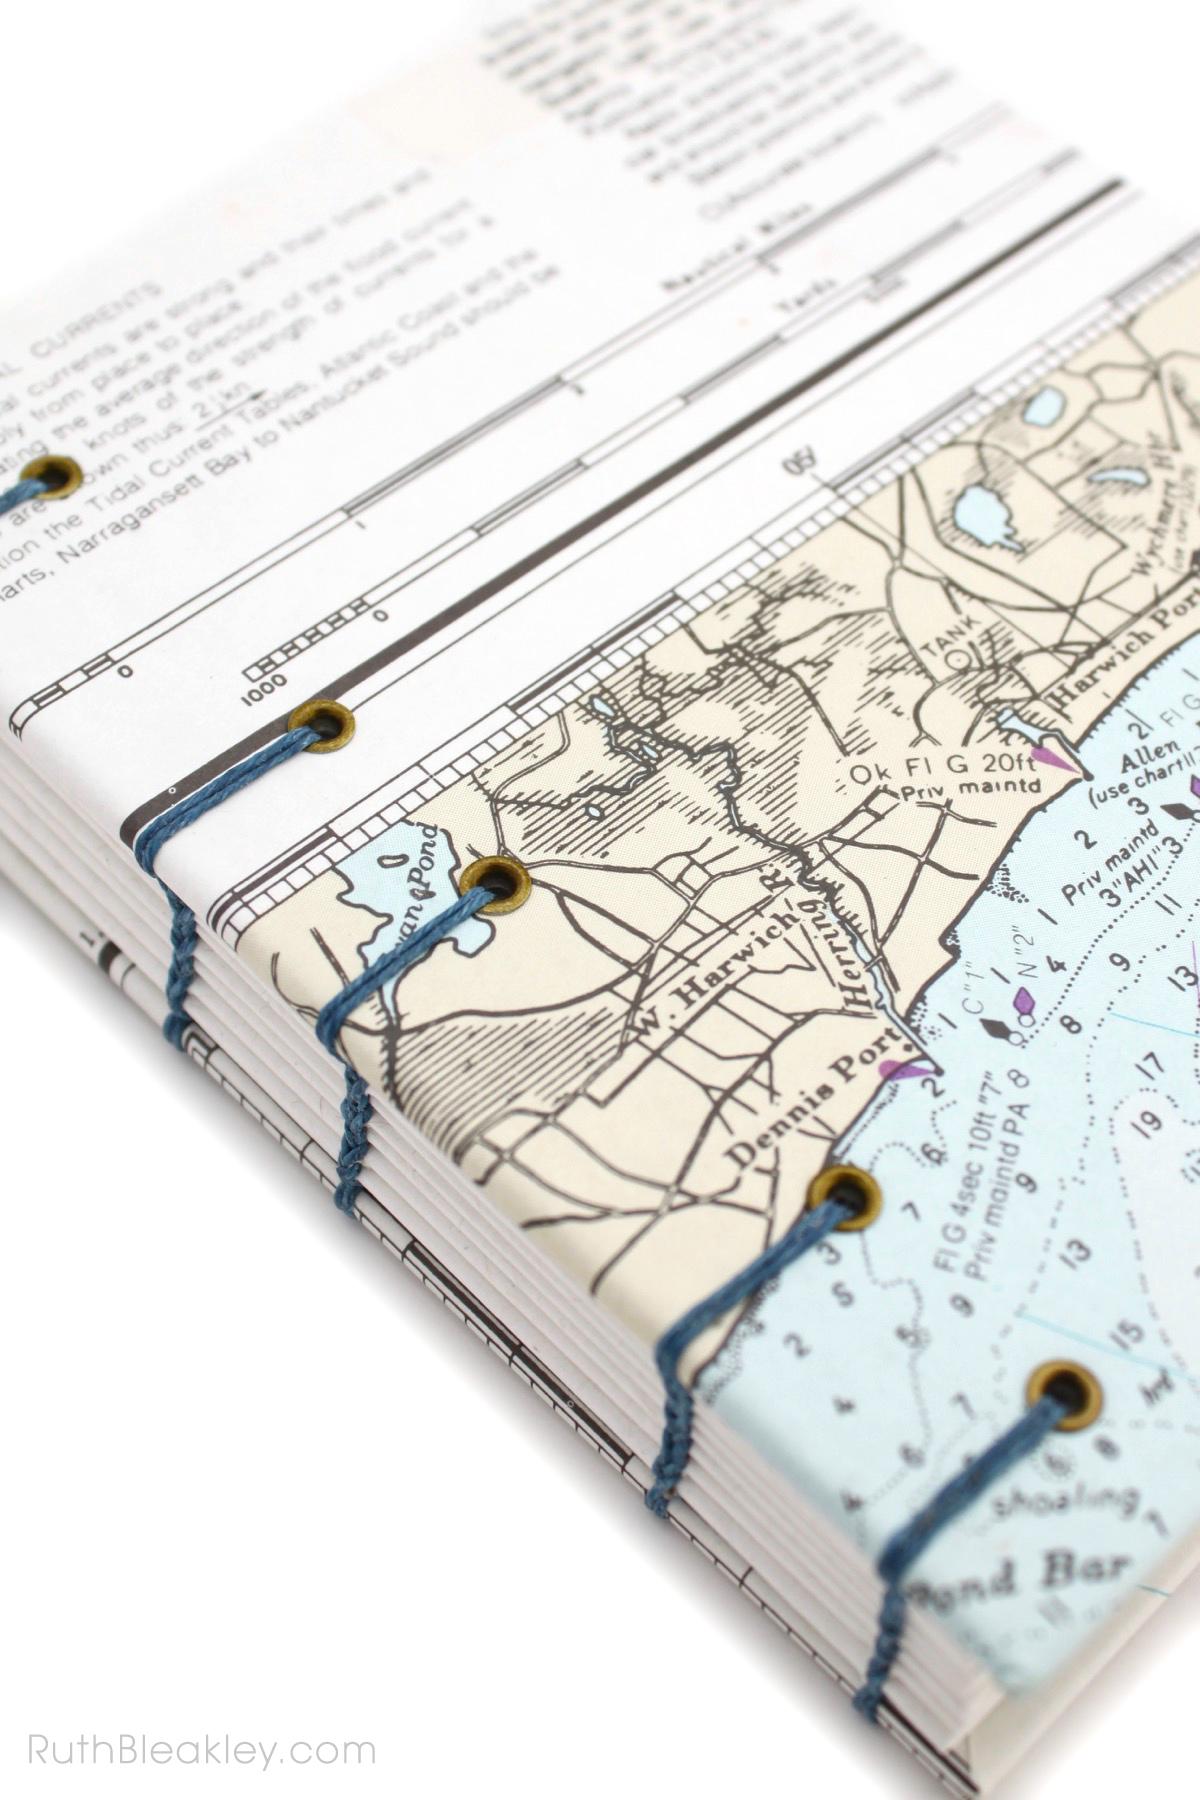 Harwich Port Nautical Chart Journal handmade by Ruth Bleakley - 3